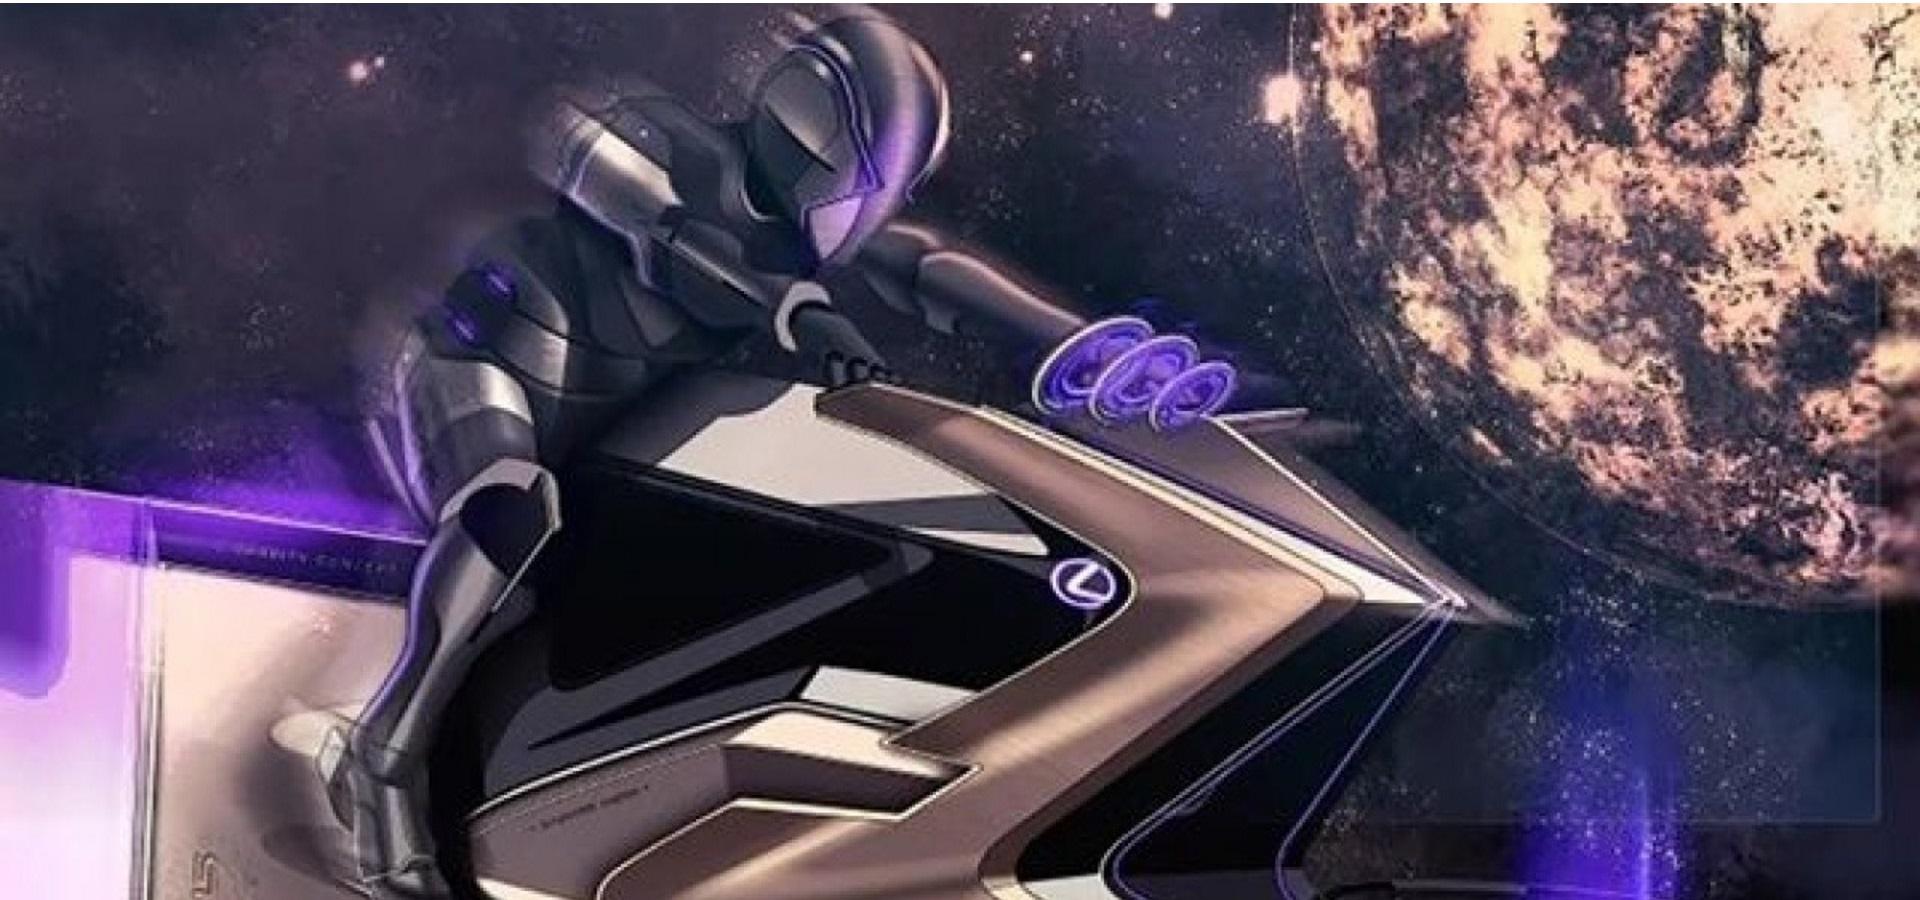 وسیله نقلیه مفهومی فضایی لکسوس